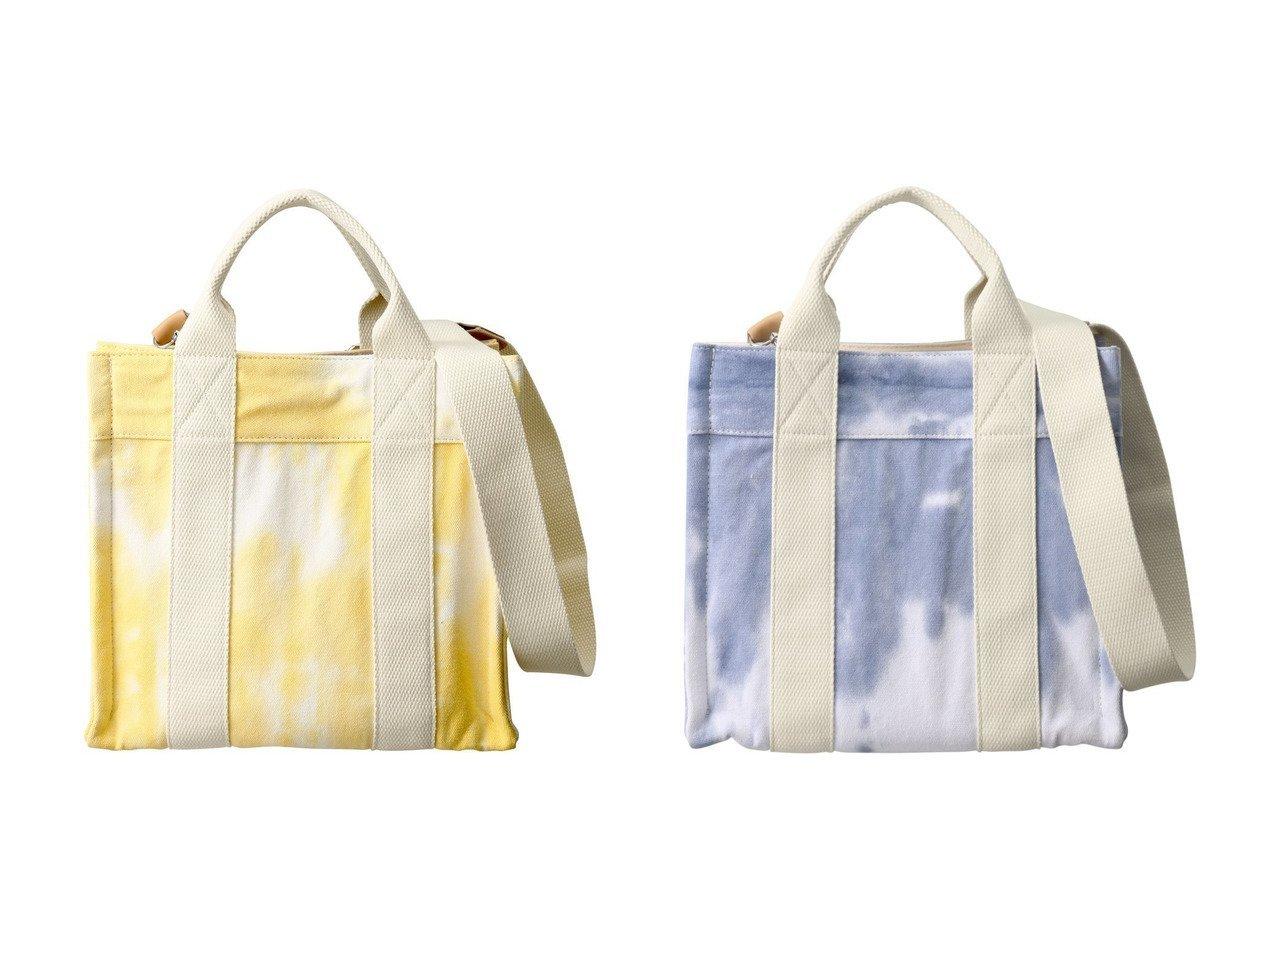 【JET/ジェット】の【JET LOSANGELES】オリジナルタイダイトートバッグ 【バッグ・鞄】おすすめ!人気、トレンド・レディースファッションの通販  おすすめで人気の流行・トレンド、ファッションの通販商品 メンズファッション・キッズファッション・インテリア・家具・レディースファッション・服の通販 founy(ファニー) https://founy.com/ ファッション Fashion レディースファッション WOMEN バッグ Bag 2021年 2021 2021春夏・S/S SS/Spring/Summer/2021 S/S・春夏 SS・Spring/Summer キャンバス ポケット 春 Spring |ID:crp329100000027381